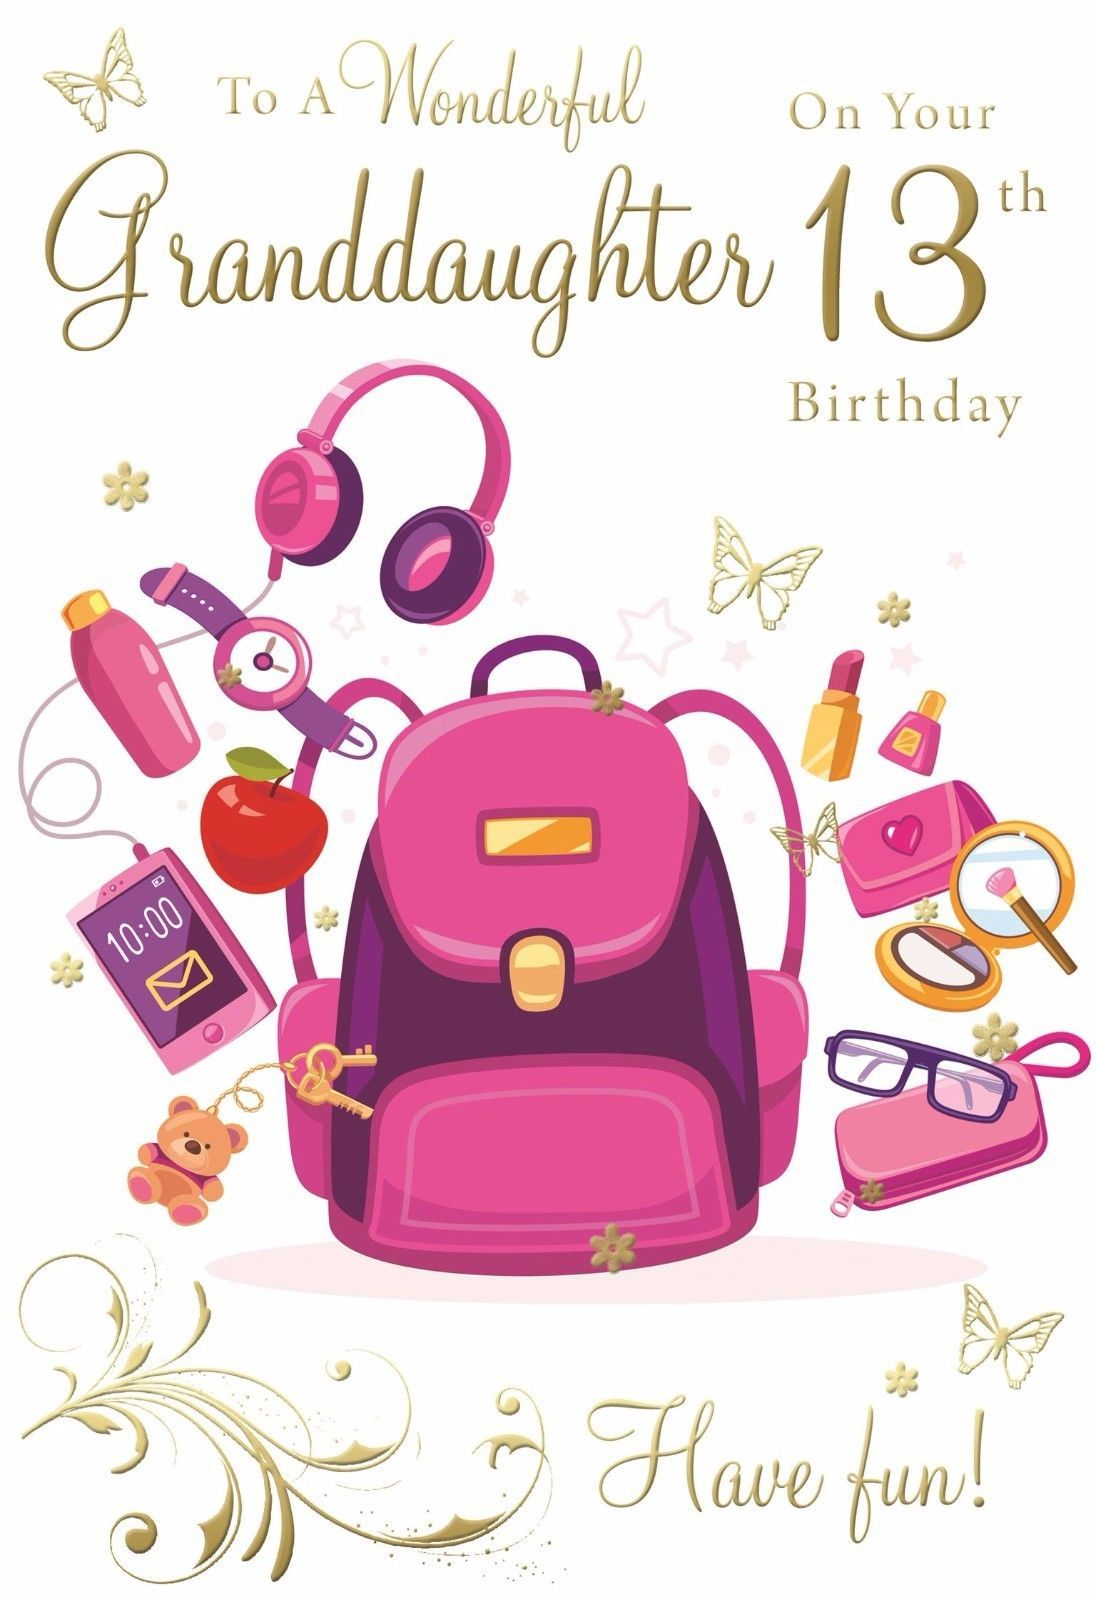 Born in august female flower word design happy birthday